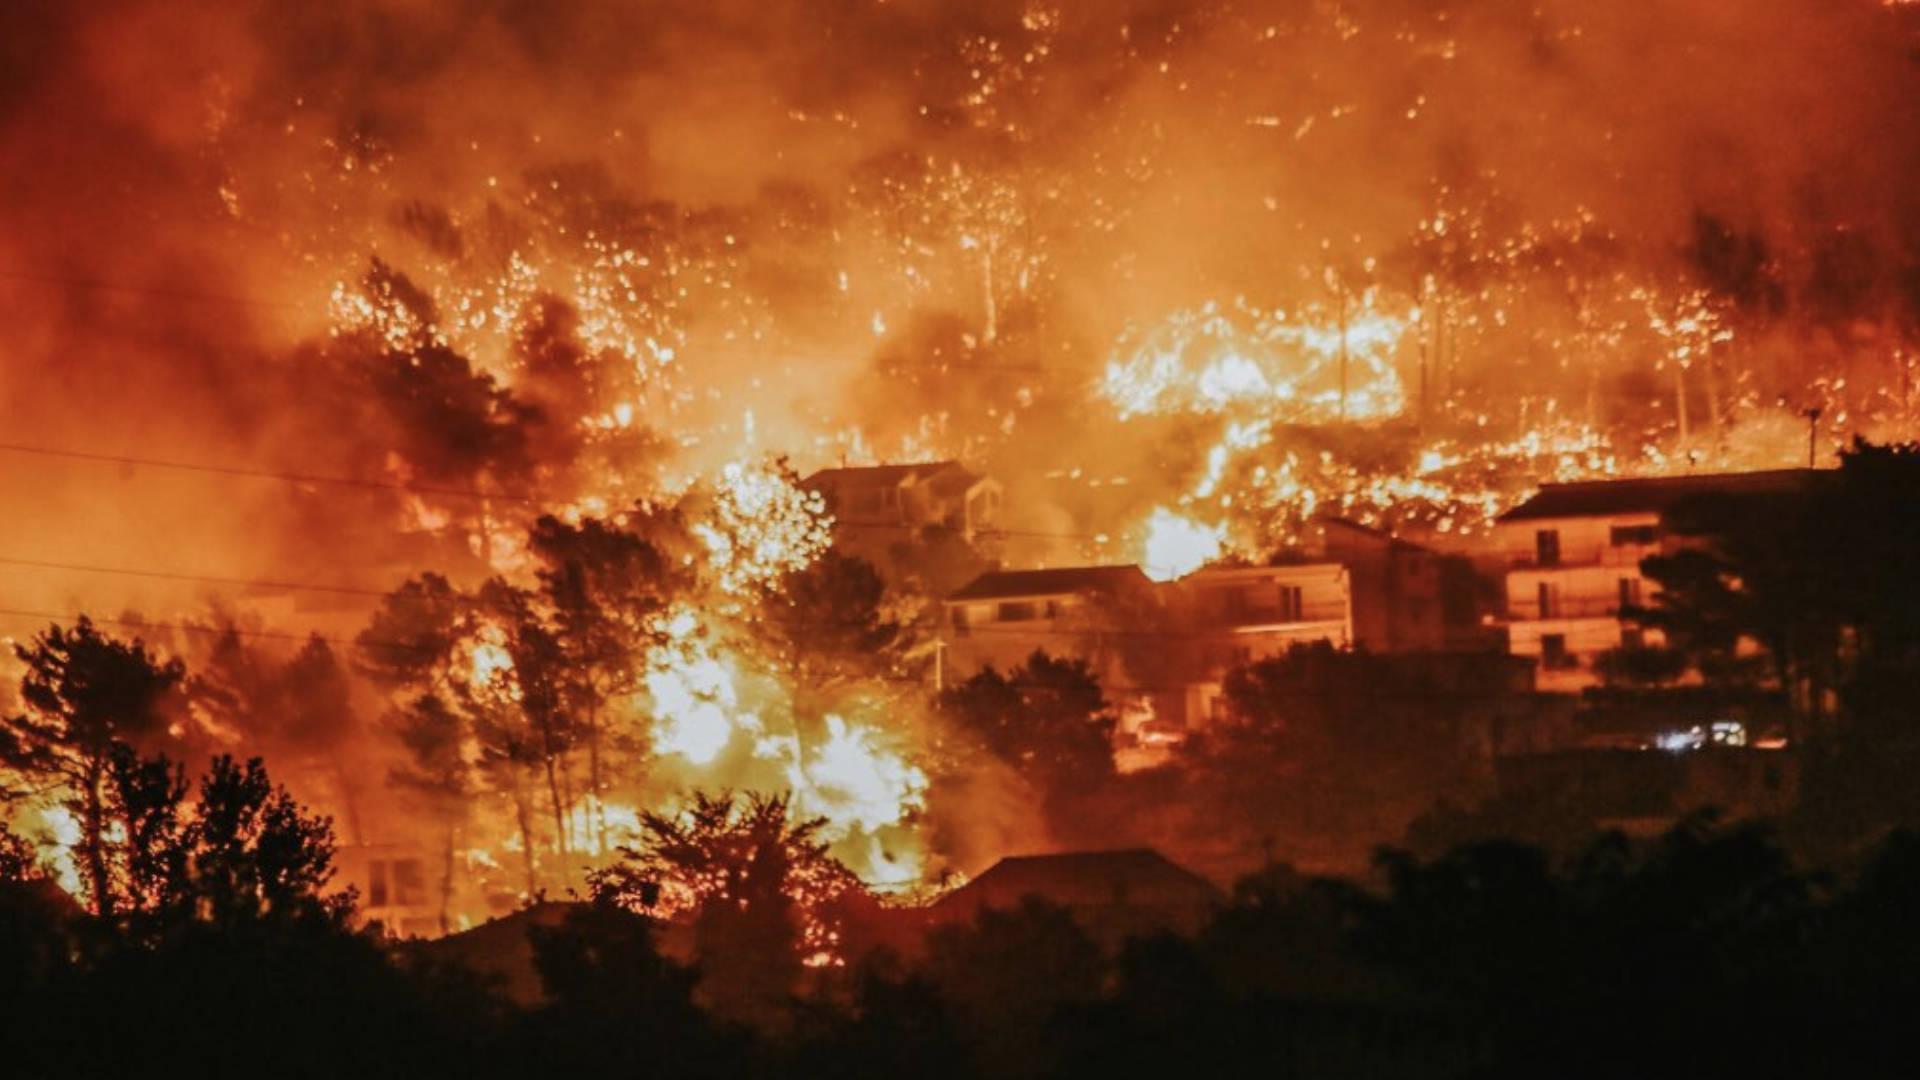 Croatia Fire: Fresh Island Festival-Goers Evacuated From Zcre Beach After Massive Blaze Breaks Out